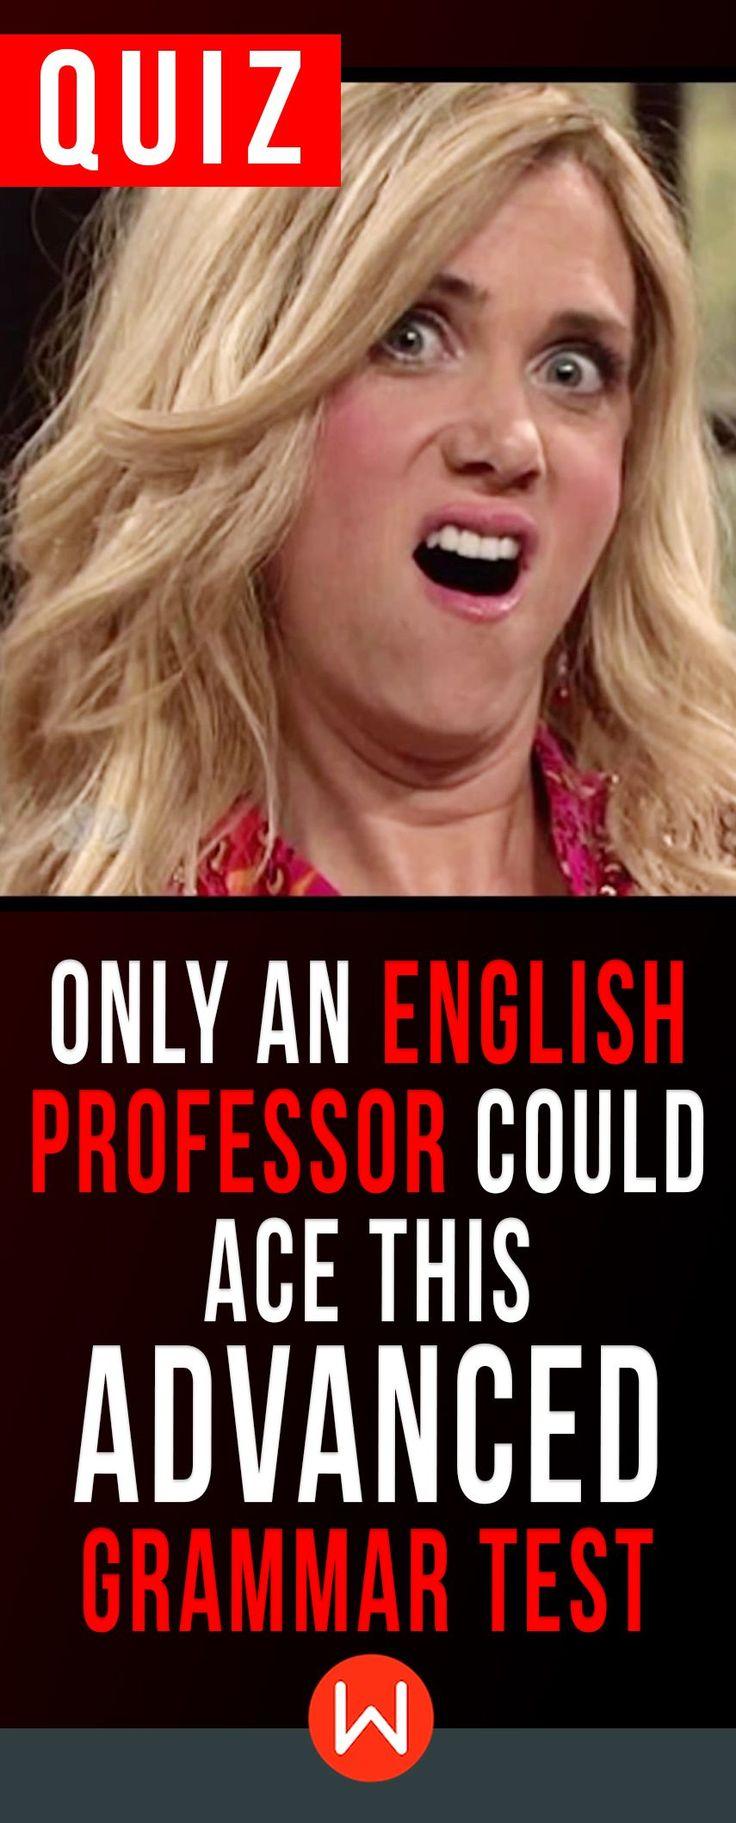 Grammar quiz - Advanced Grammar questions that only an English Professor could answer. Calling all grammar gurus! ESL teachers, ESL students, English Grammar, Grammar trivia questions. Prepositions, verbs, nouns... How good is your Grammar?